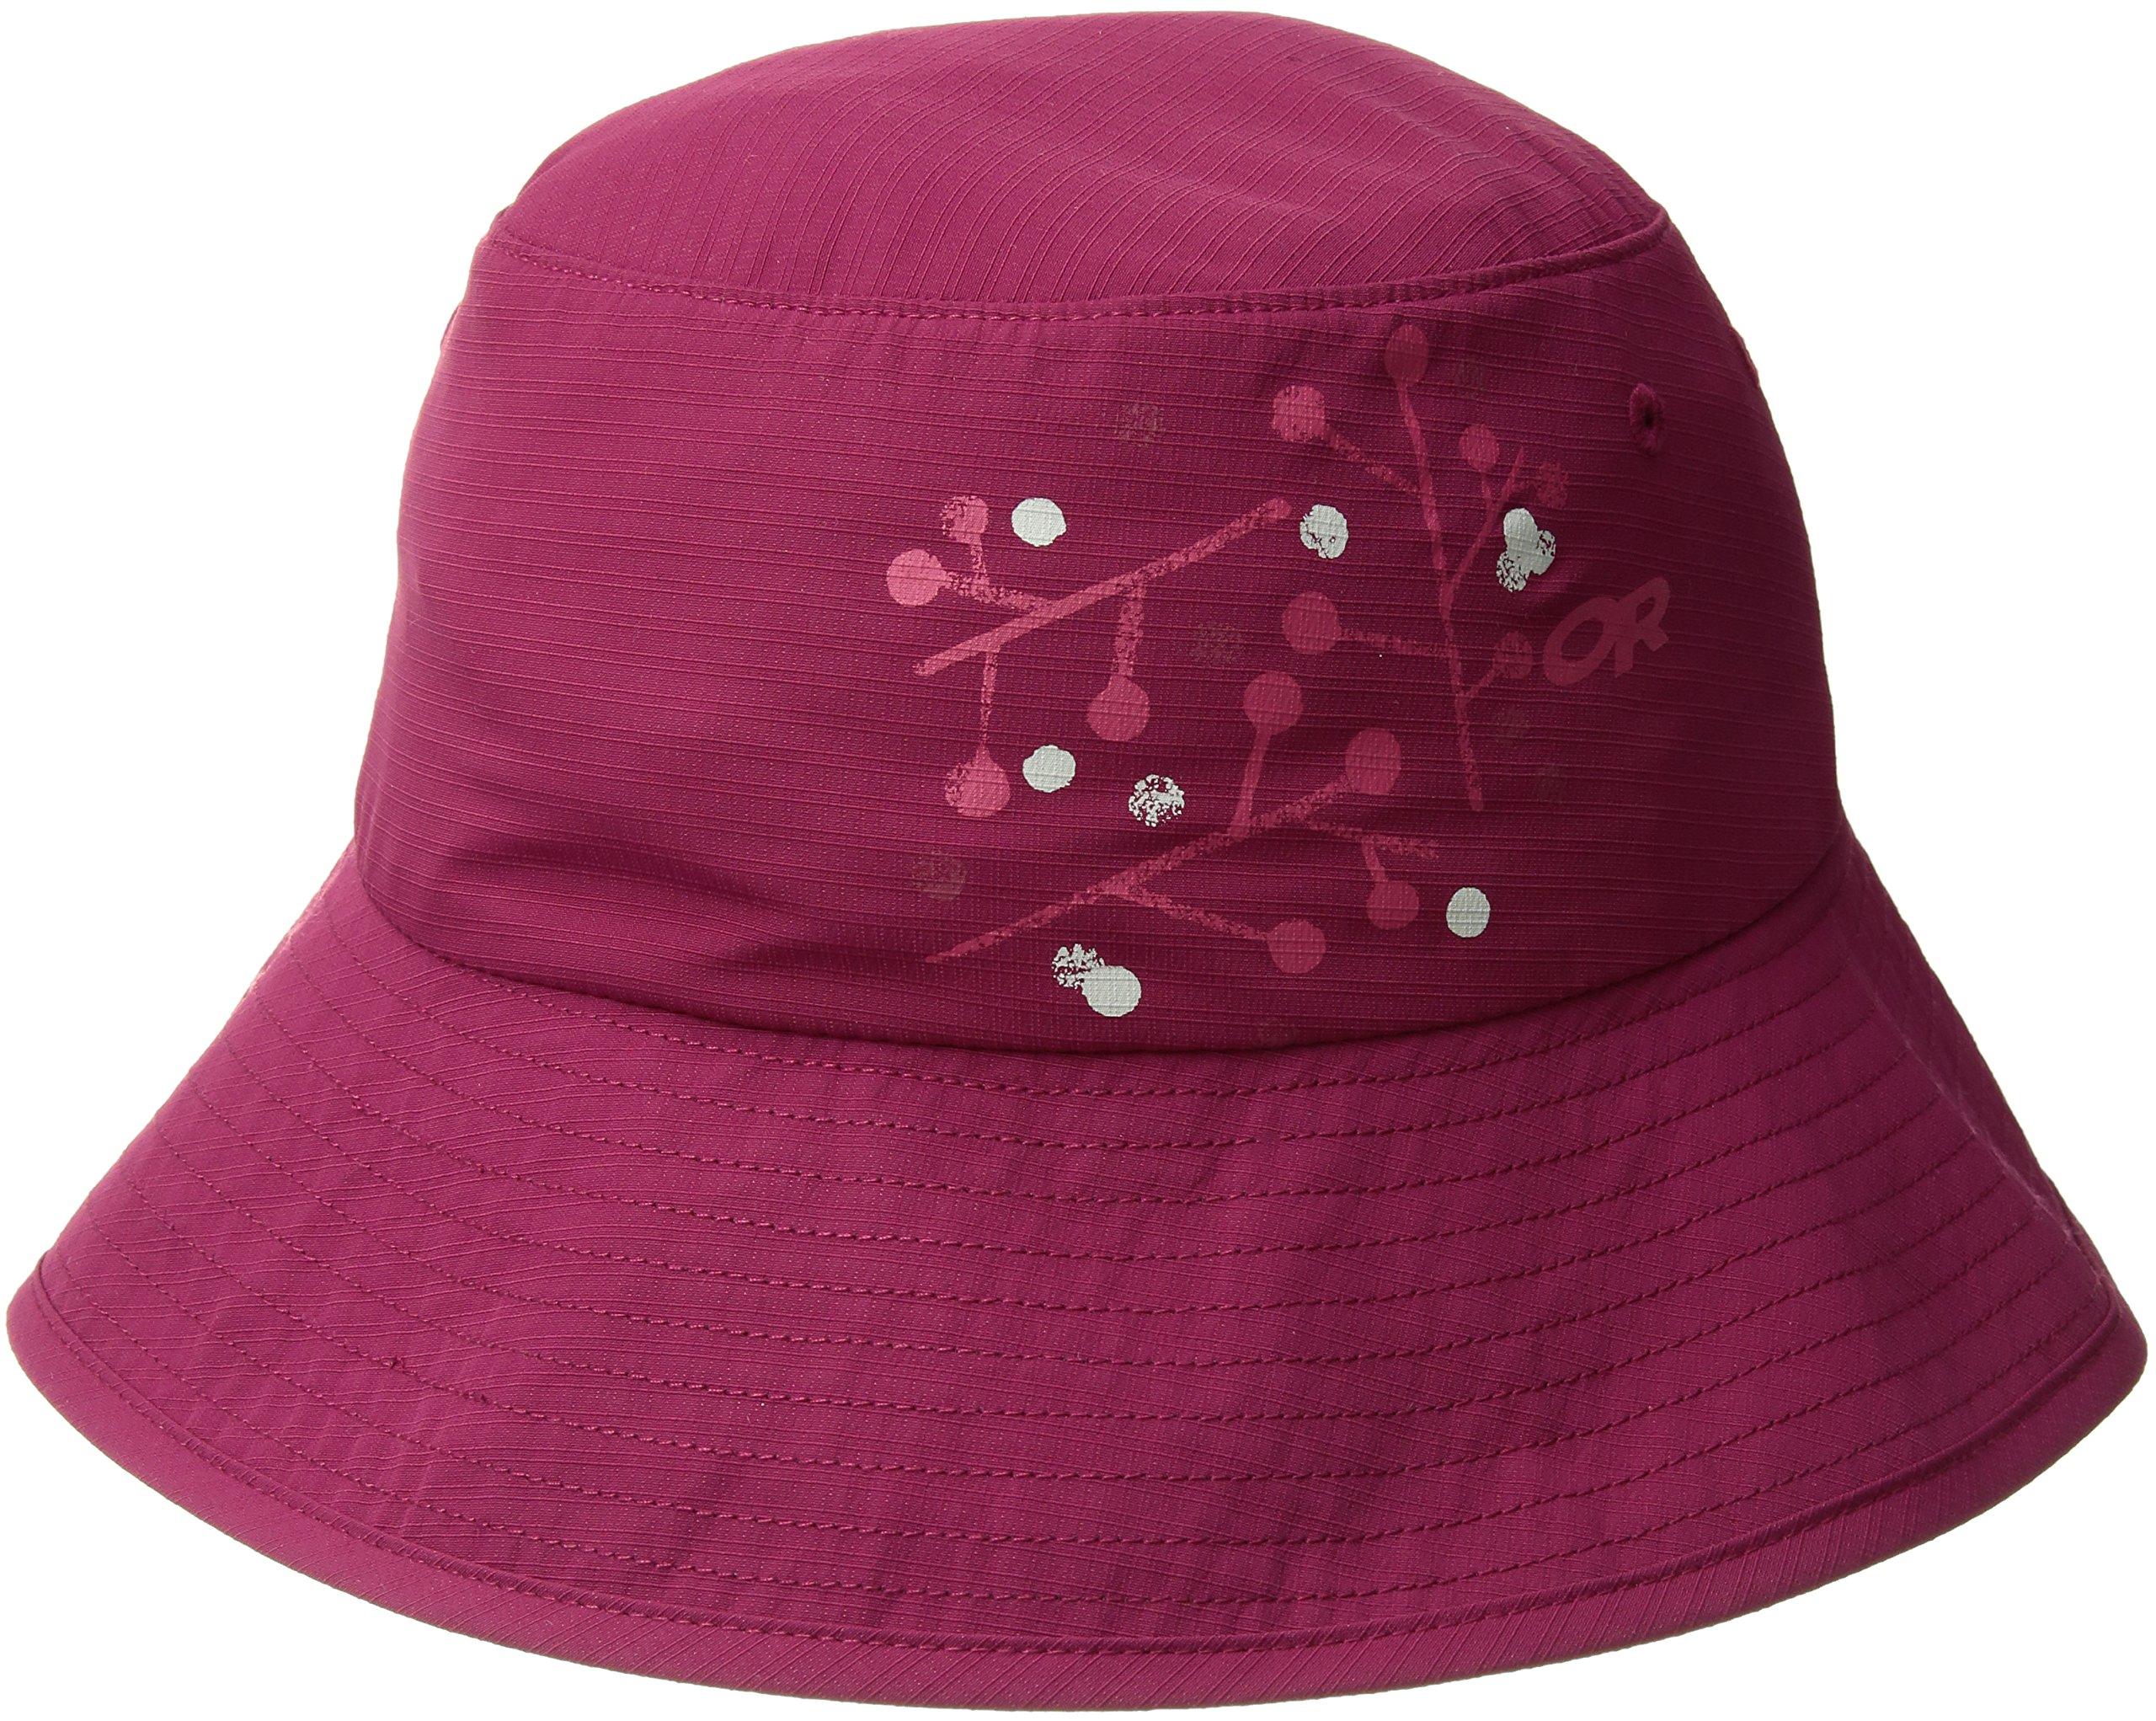 Outdoor Research Women's Solaris Sun Bucket Hat, Raspberry, Medium